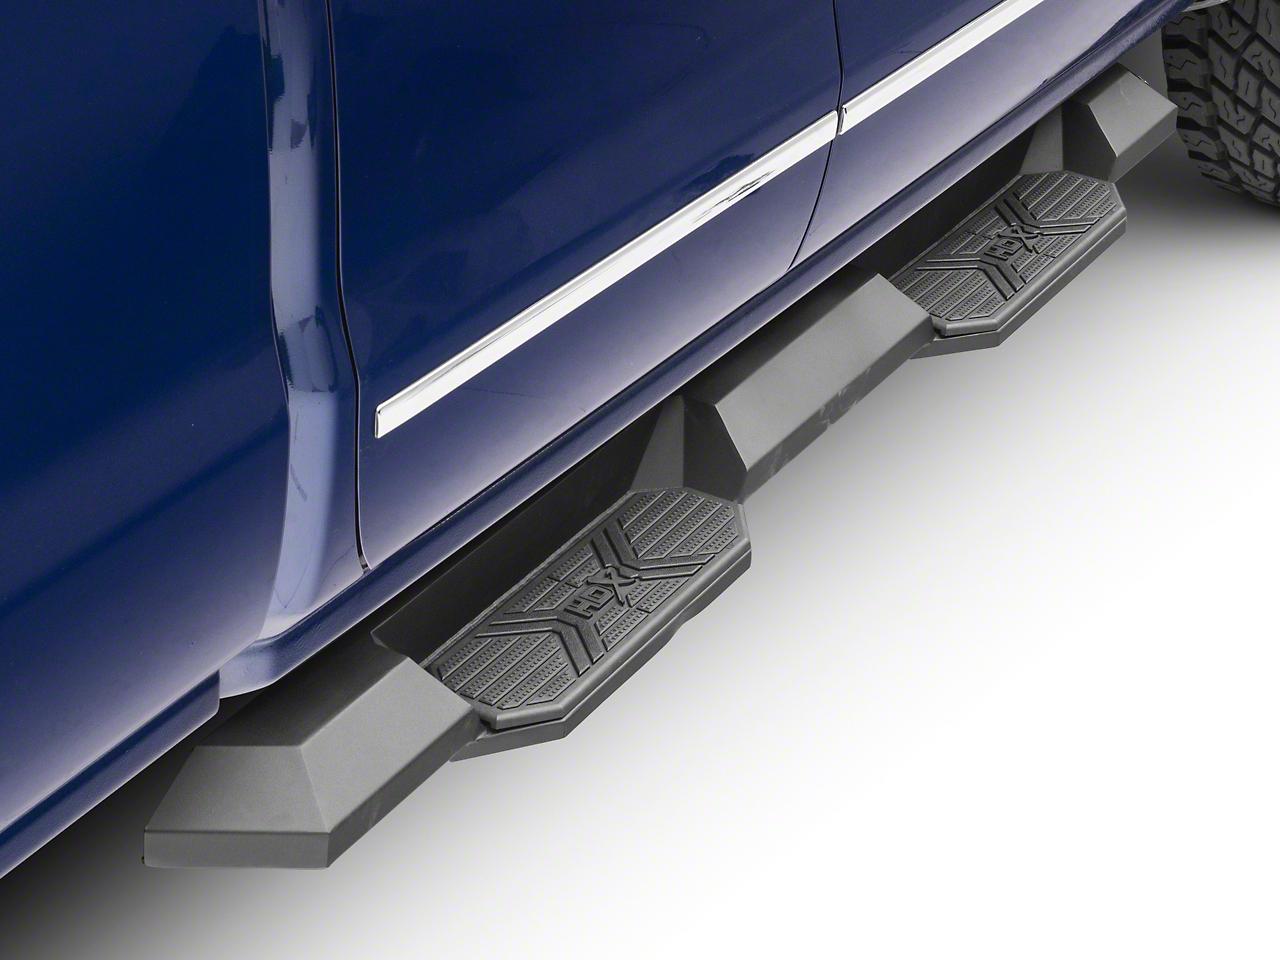 Westin HDX Xtreme Nerf Step Bars - Black (14-18 Silverado 1500 Double Cab, Crew Cab)